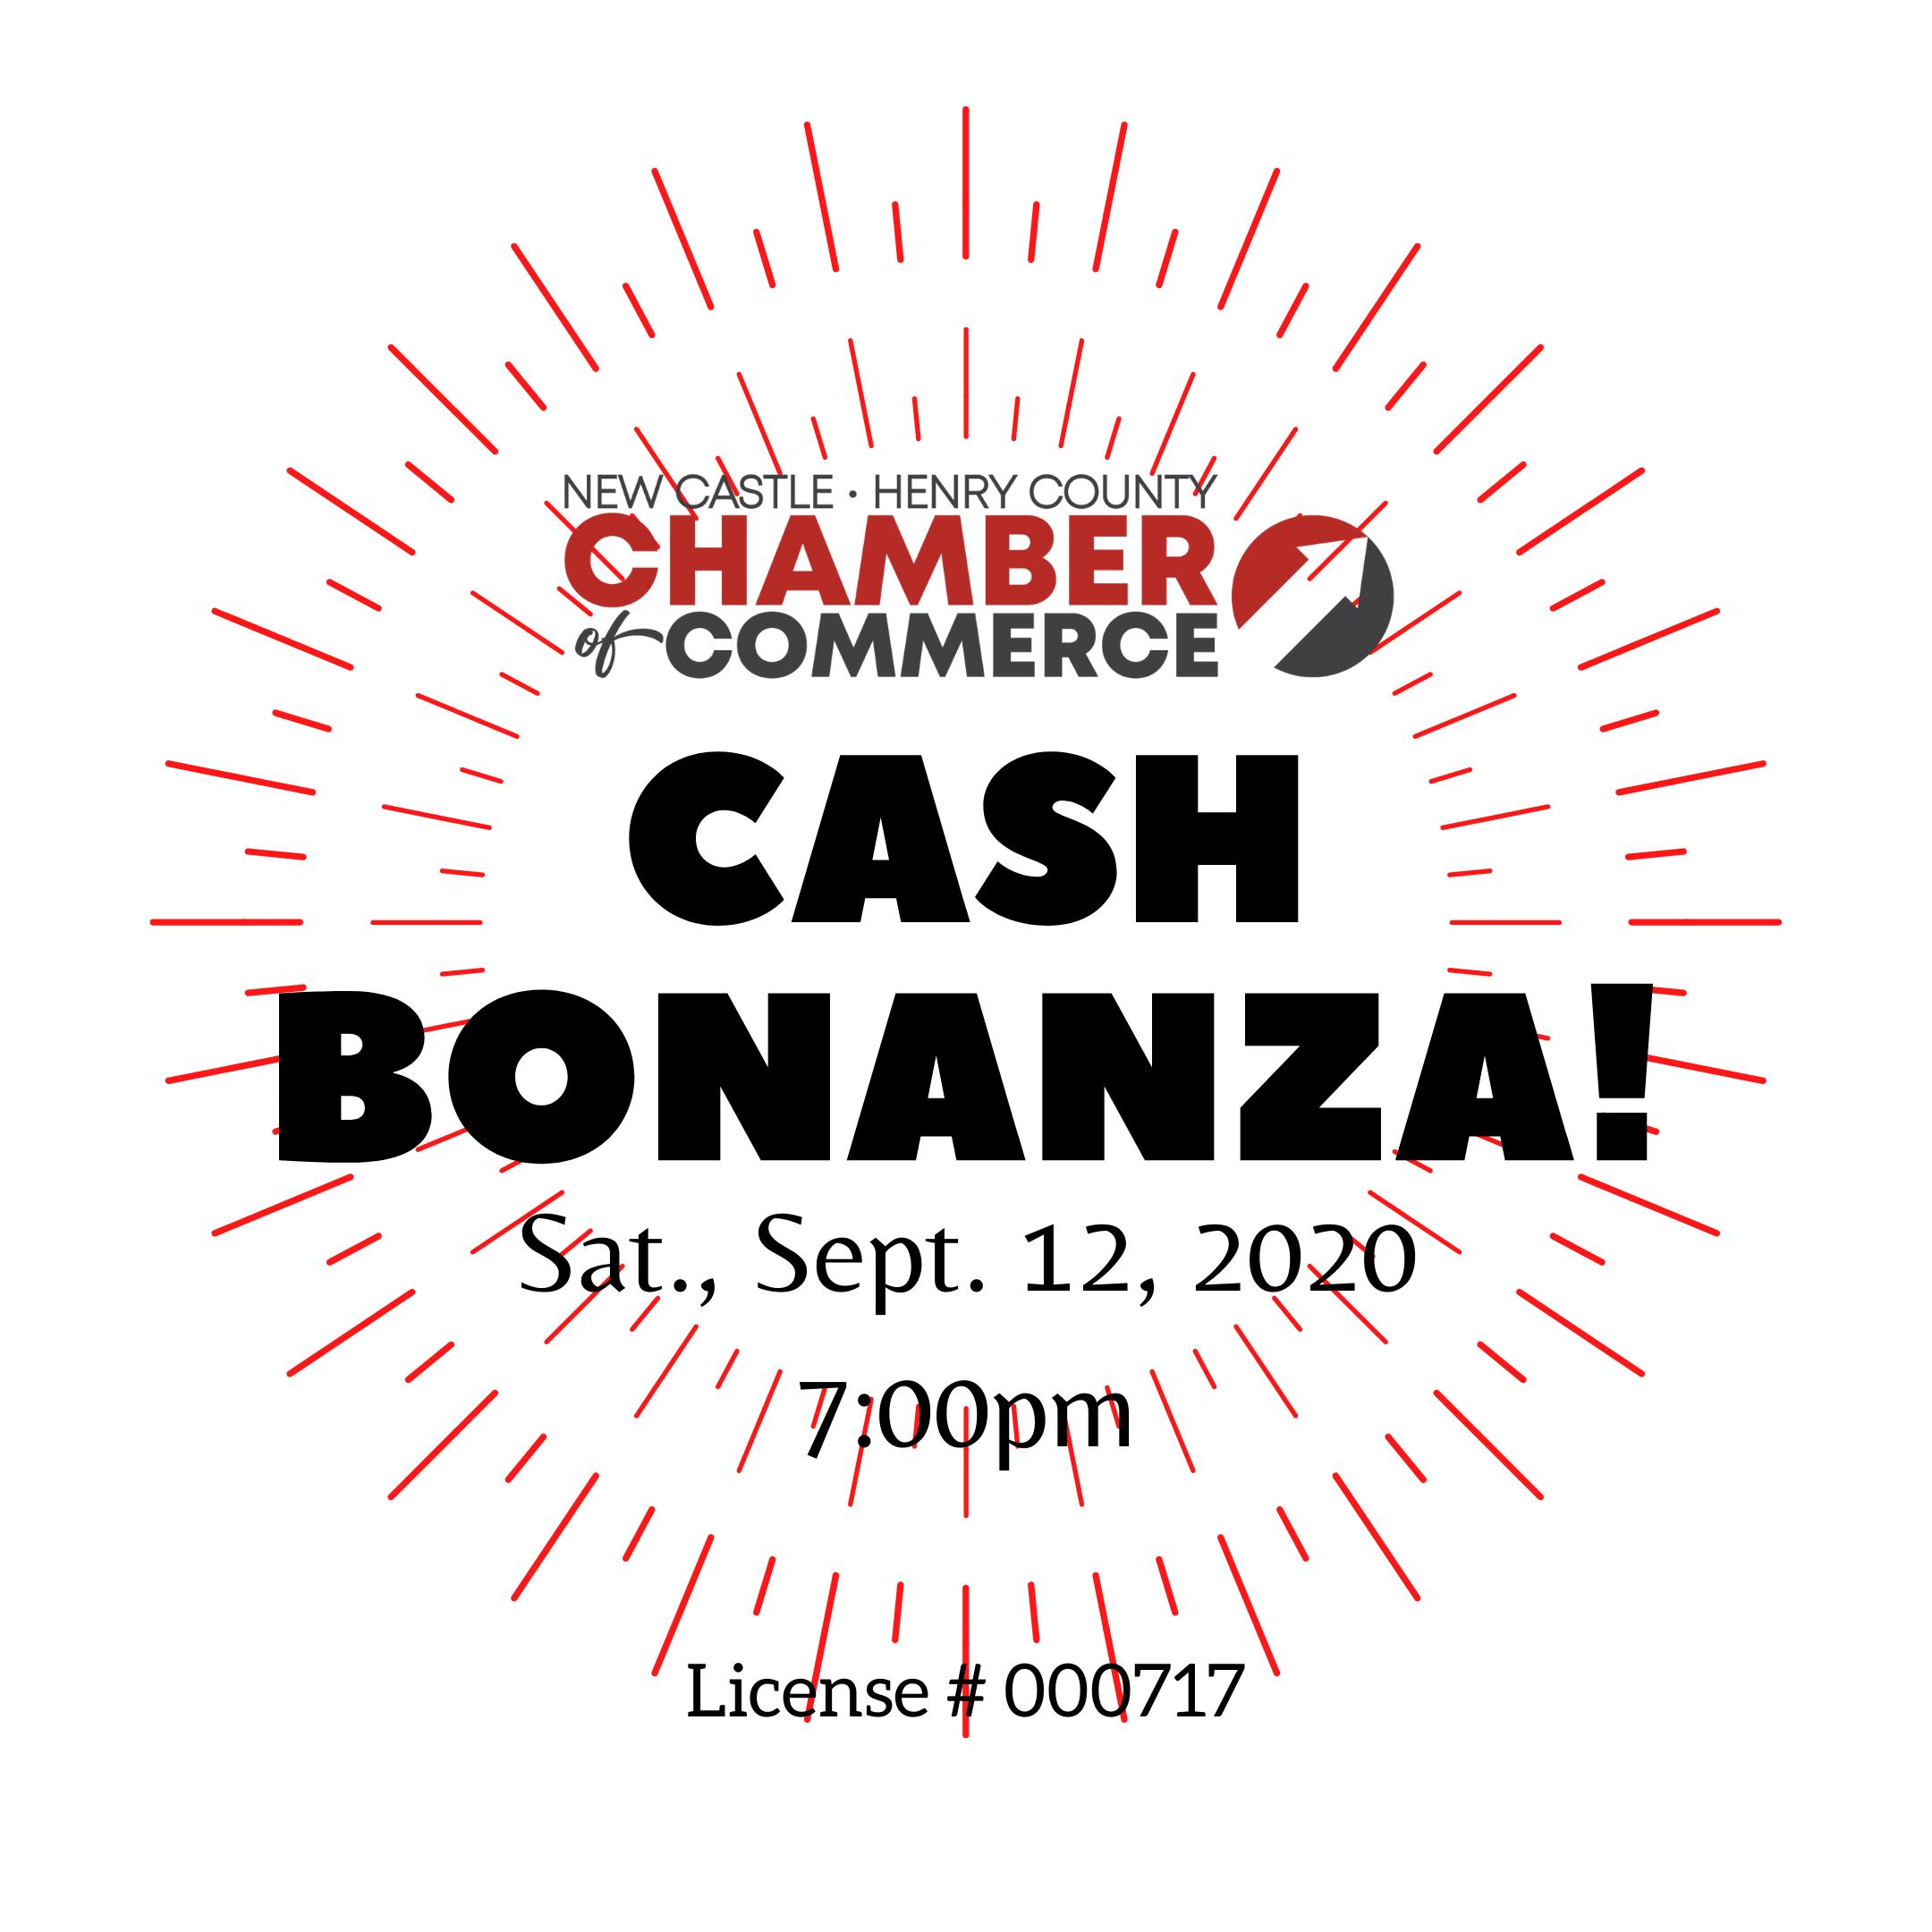 Cash Bonanza 2020